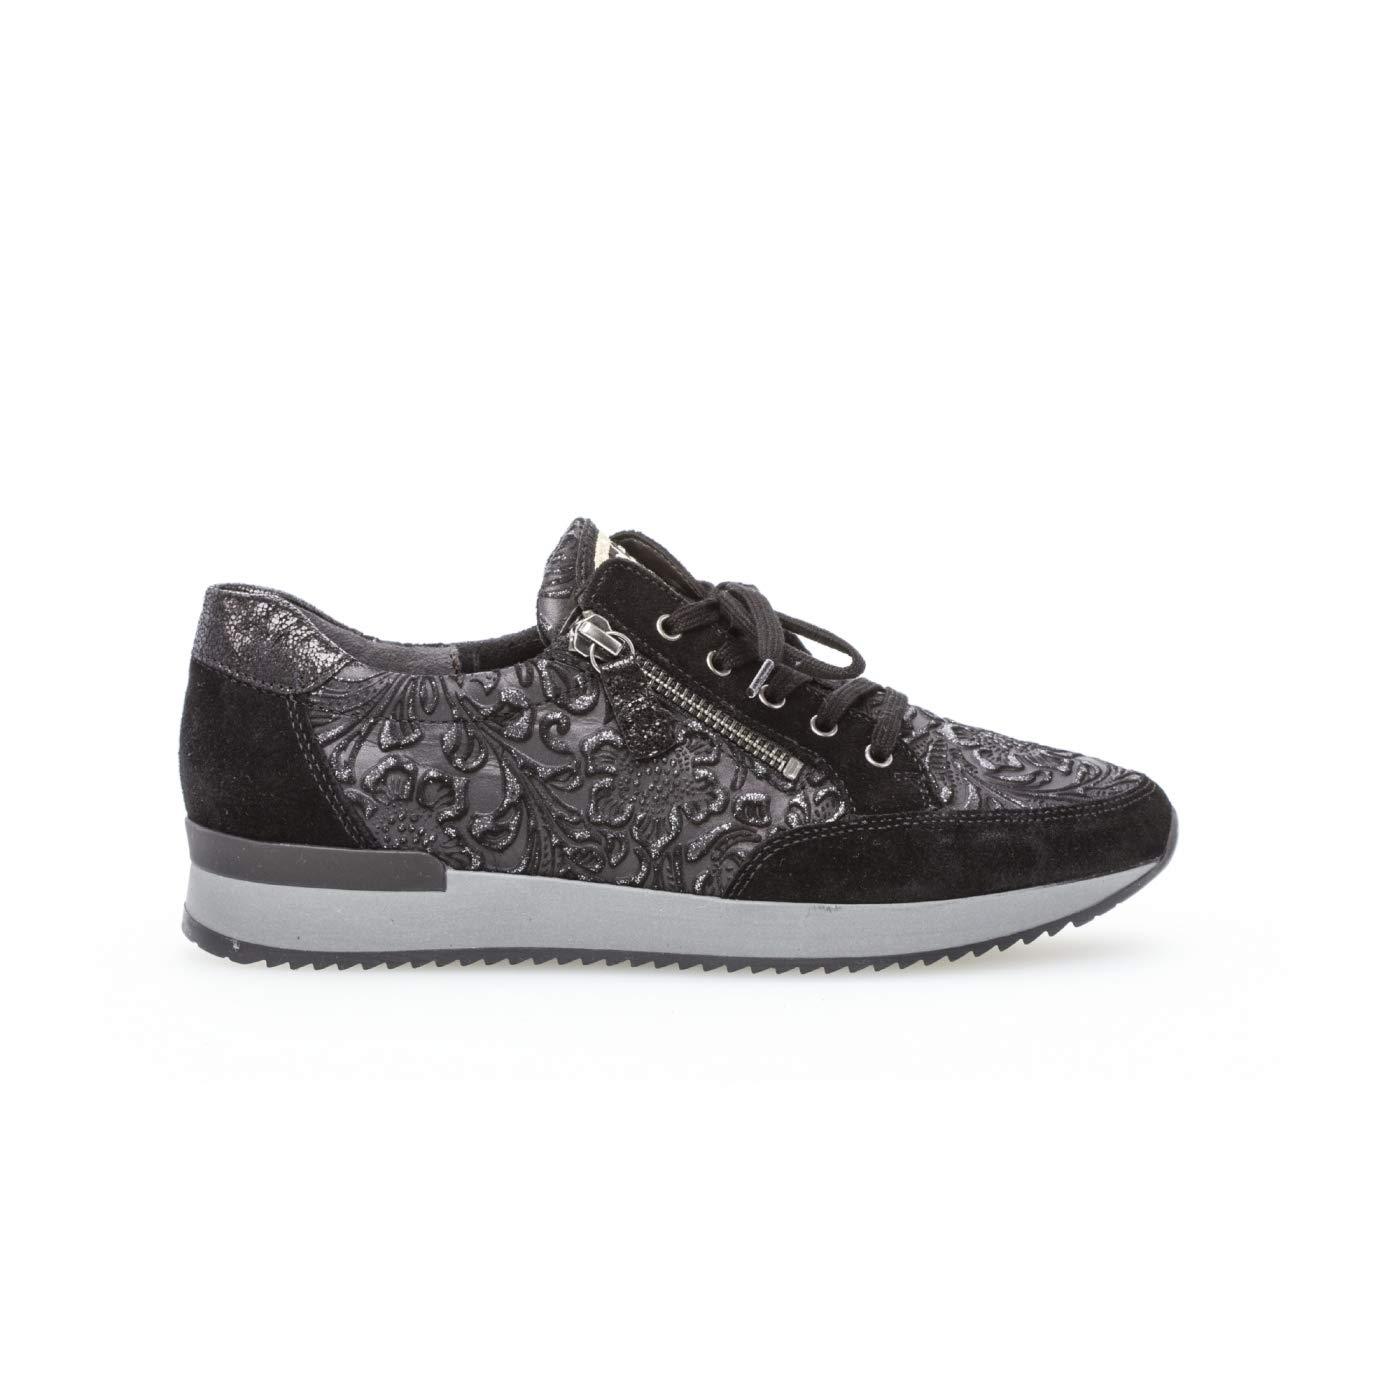 Gabor - Sneakers Marron 10694 - Noir Gabor - 37-4 - - 2c30329 - fast-weightloss-diet.space